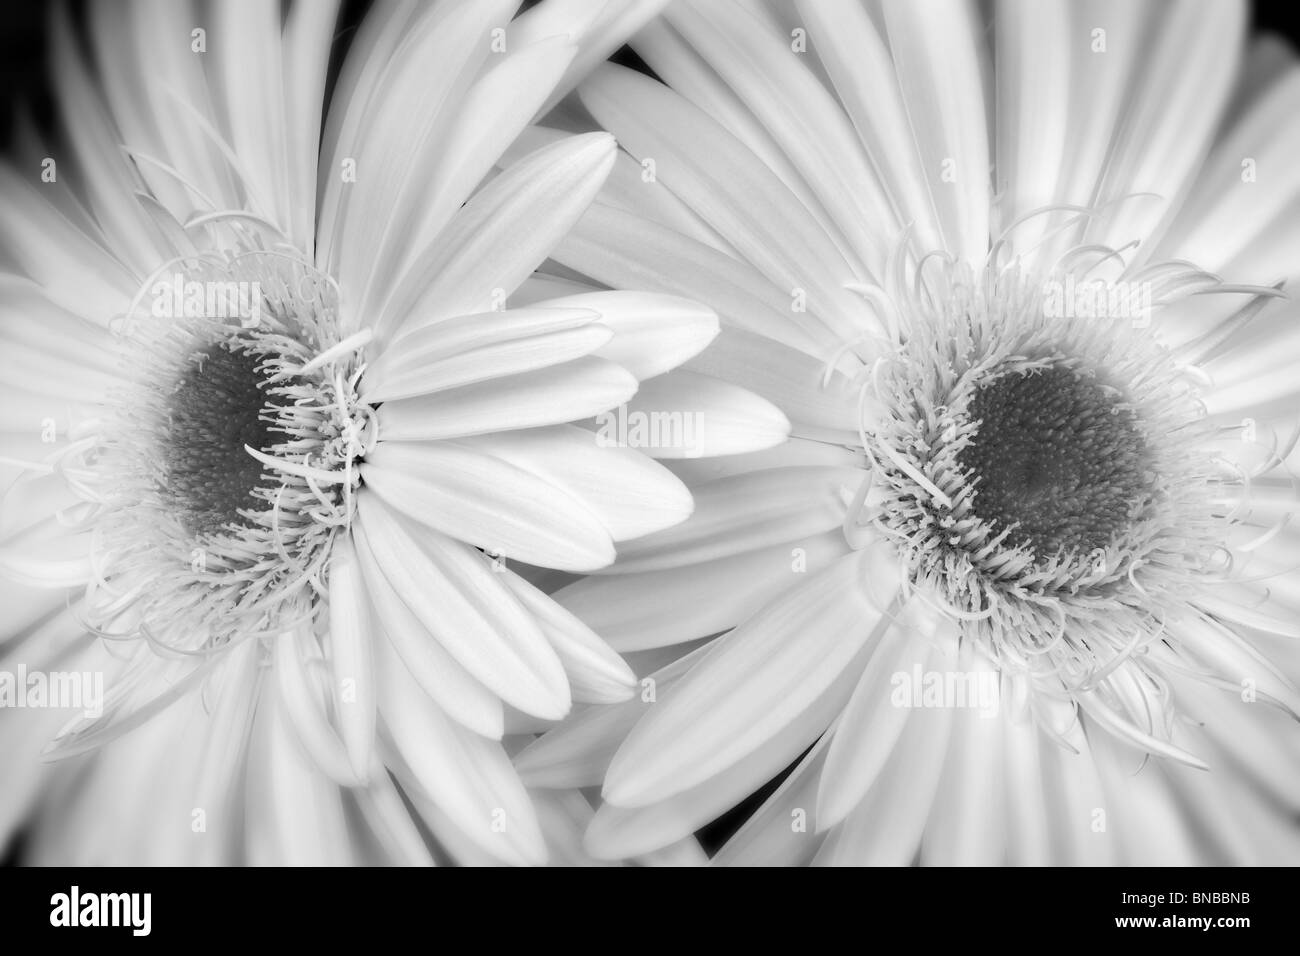 Gerbera Daisy Black And White Stock Photos Images Alamy